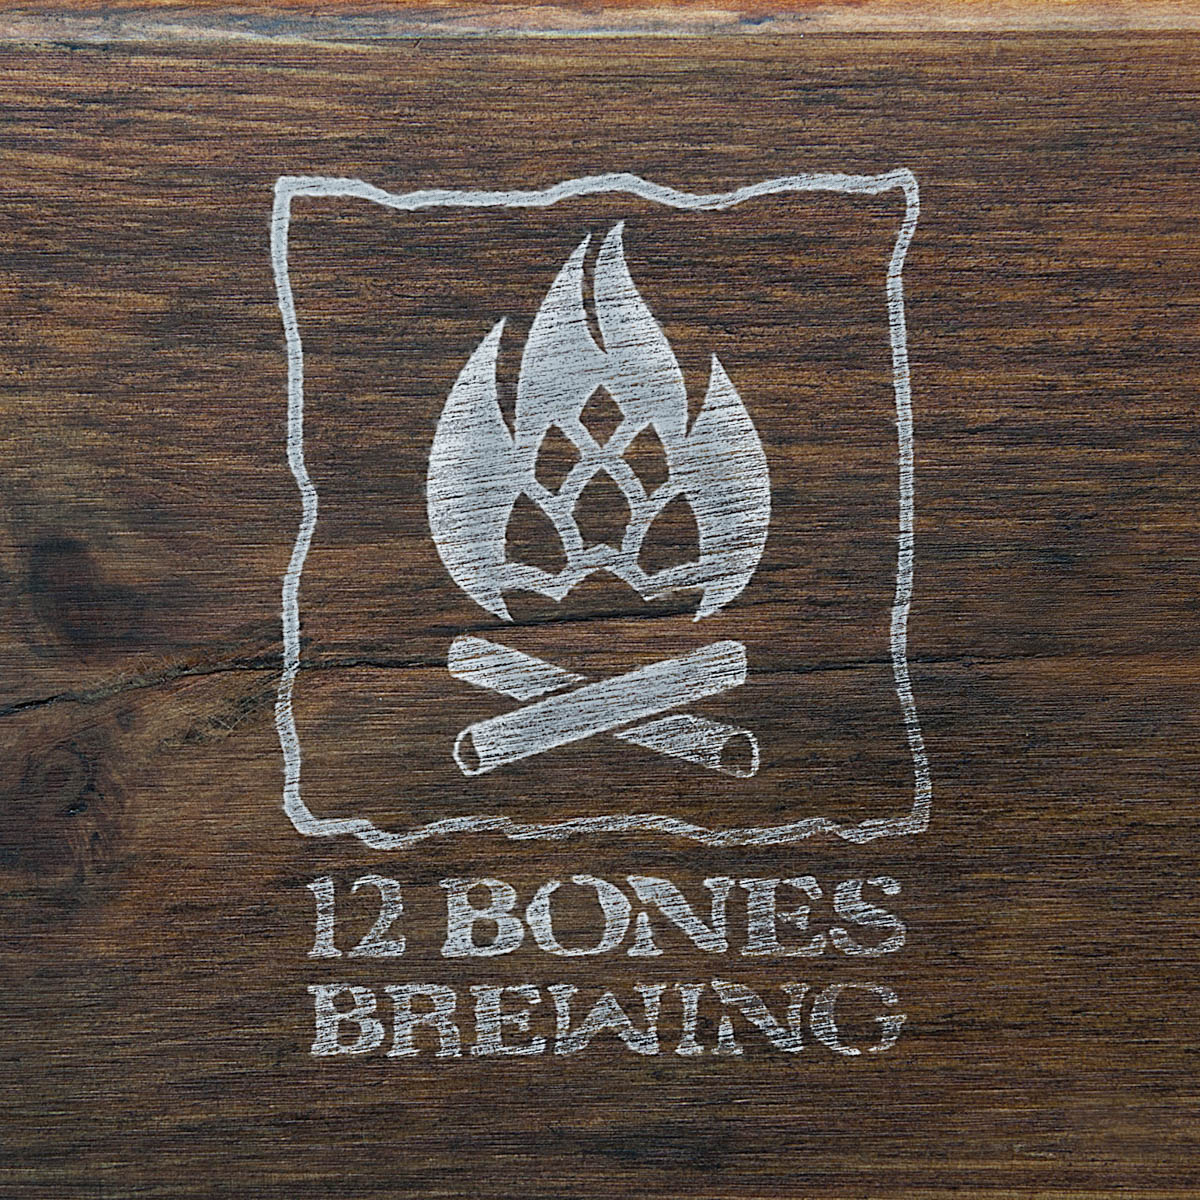 What's Brewing: 12 Bones Brewing